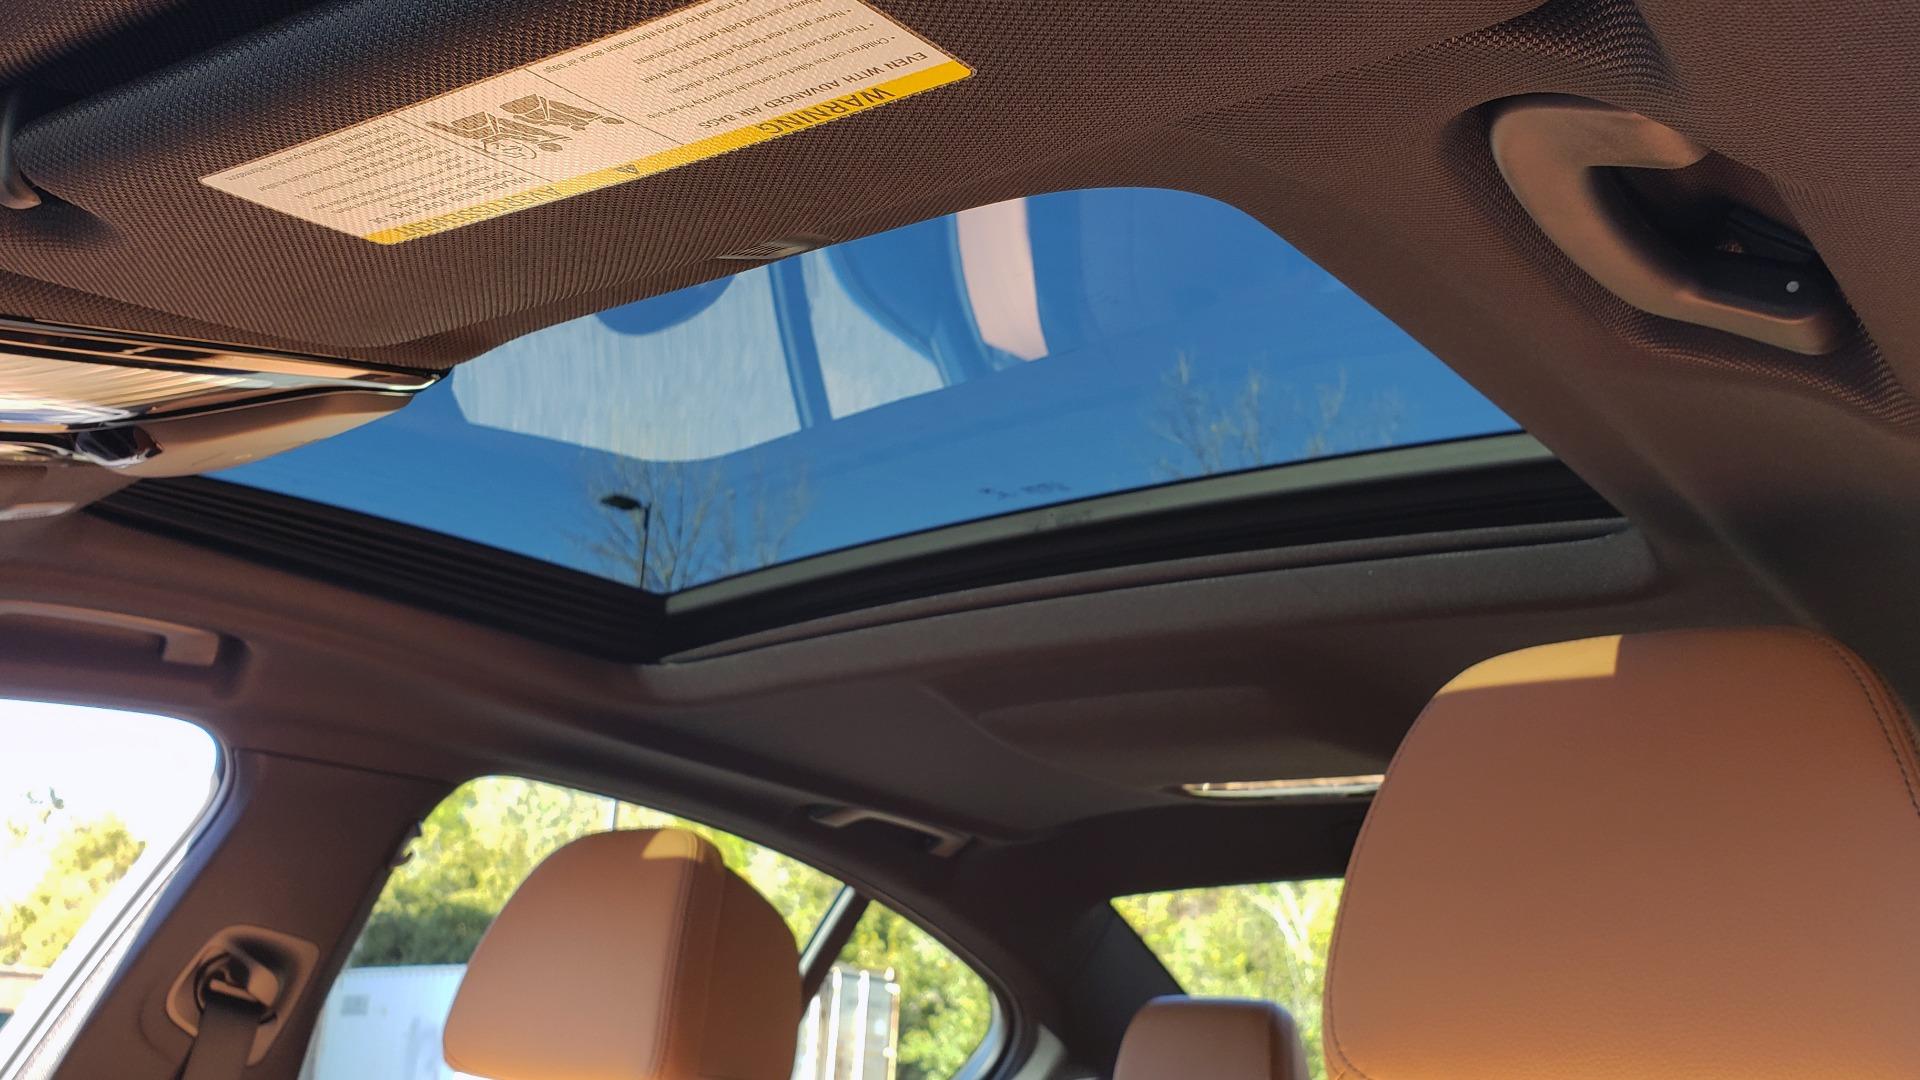 Used 2018 BMW 5 SERIES 540I M-SPORT / DRVR ASST / EXEC PKG / NAV / SUNROOF / HUD / REARVIEW for sale Sold at Formula Imports in Charlotte NC 28227 25